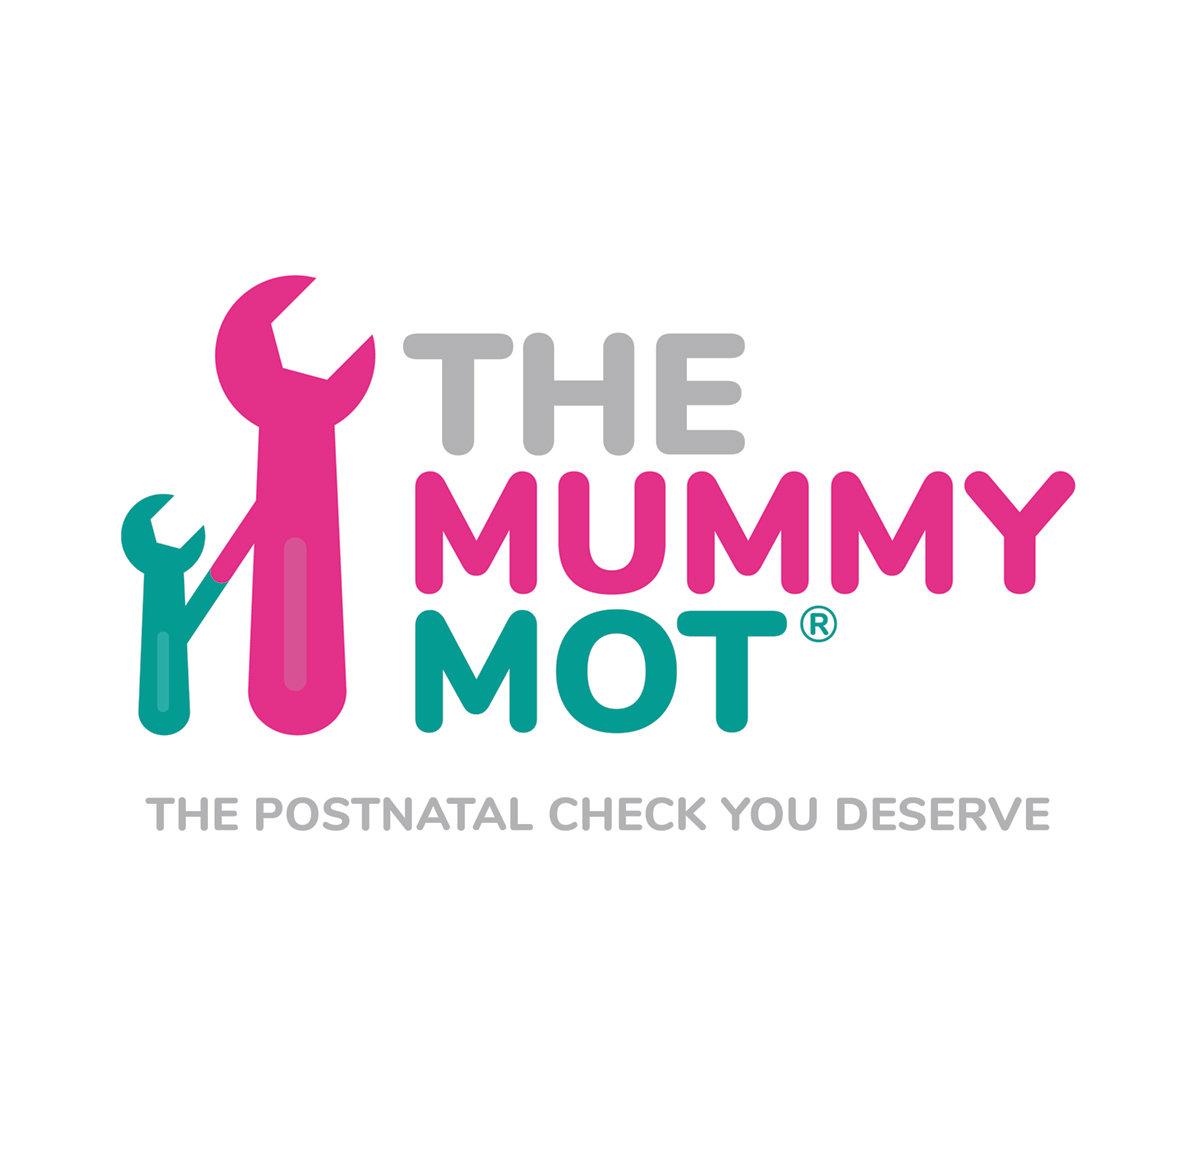 Face to face Mummy MOT